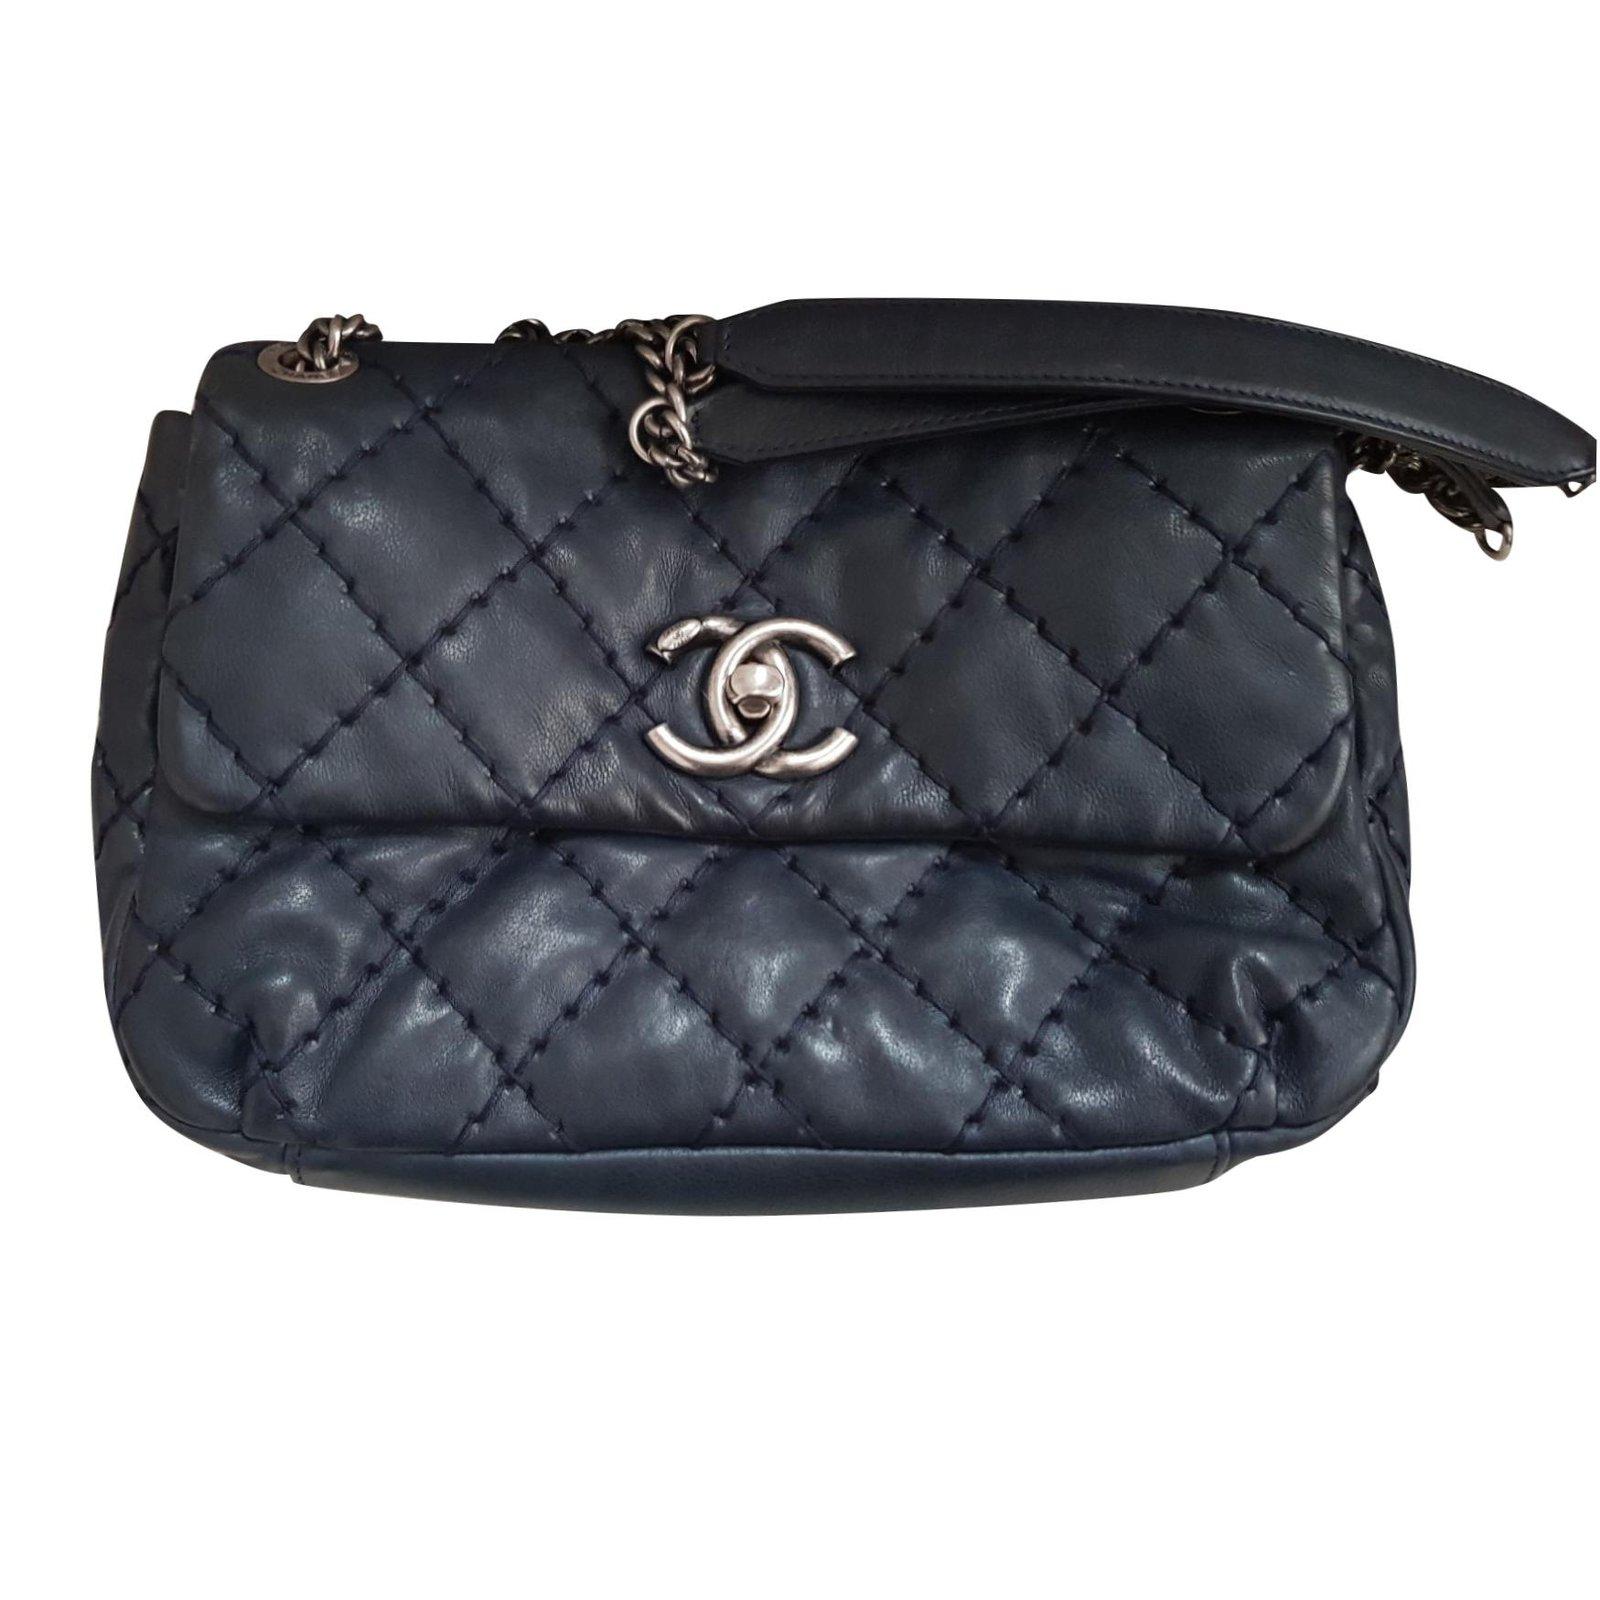 1cc443568cb62 Chanel Chanel bag Handbags Leather Navy blue ref.100883 - Joli Closet